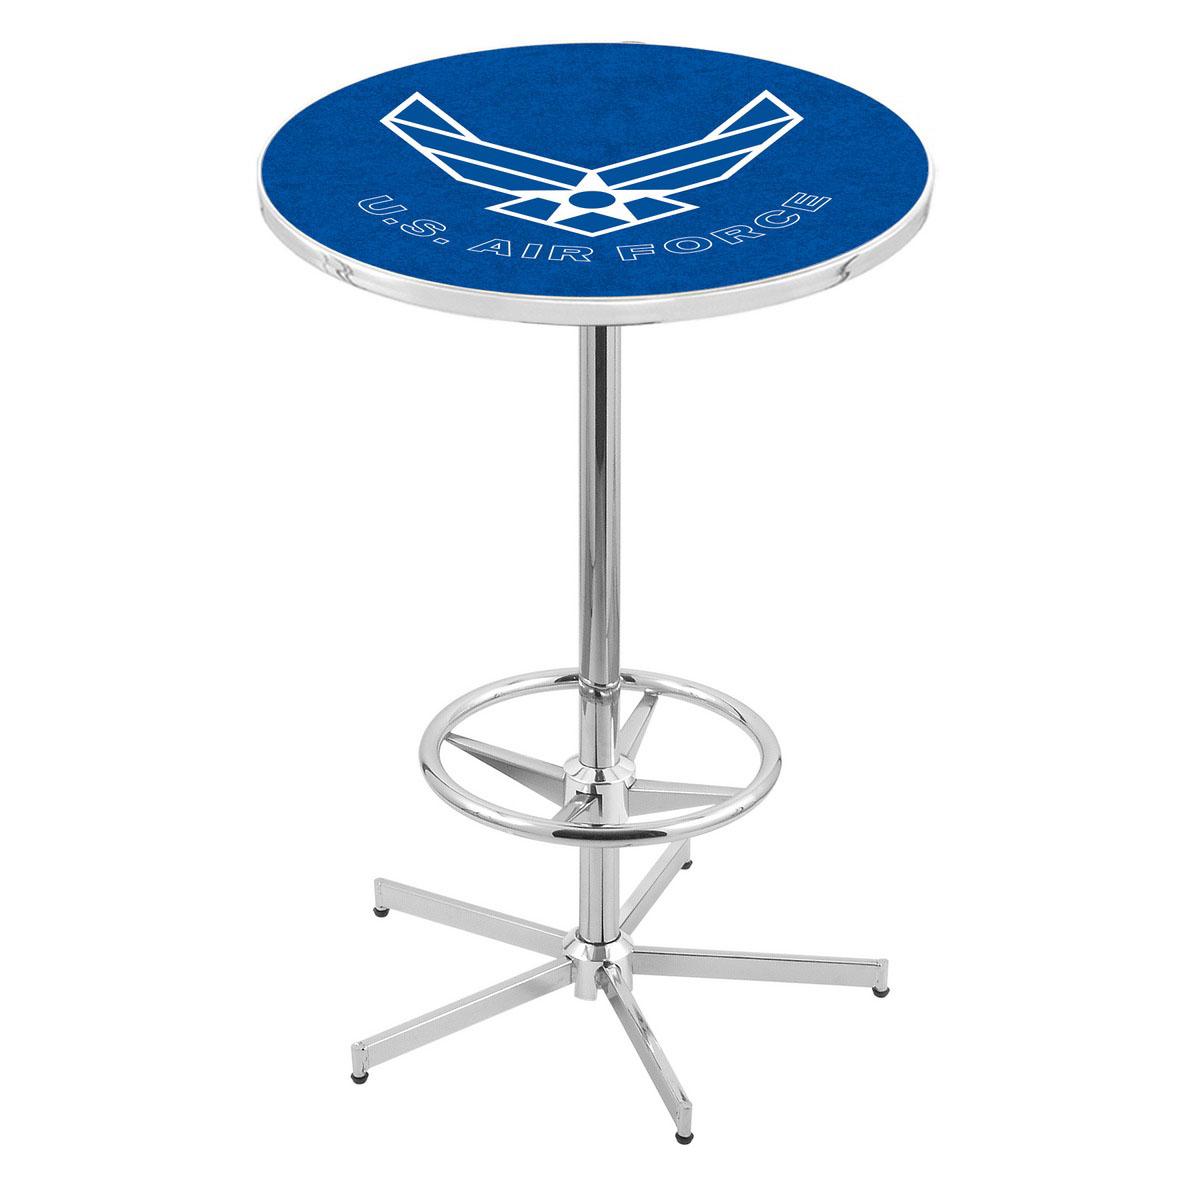 Purchase Chrome U Air Force Pub Table Product Photo